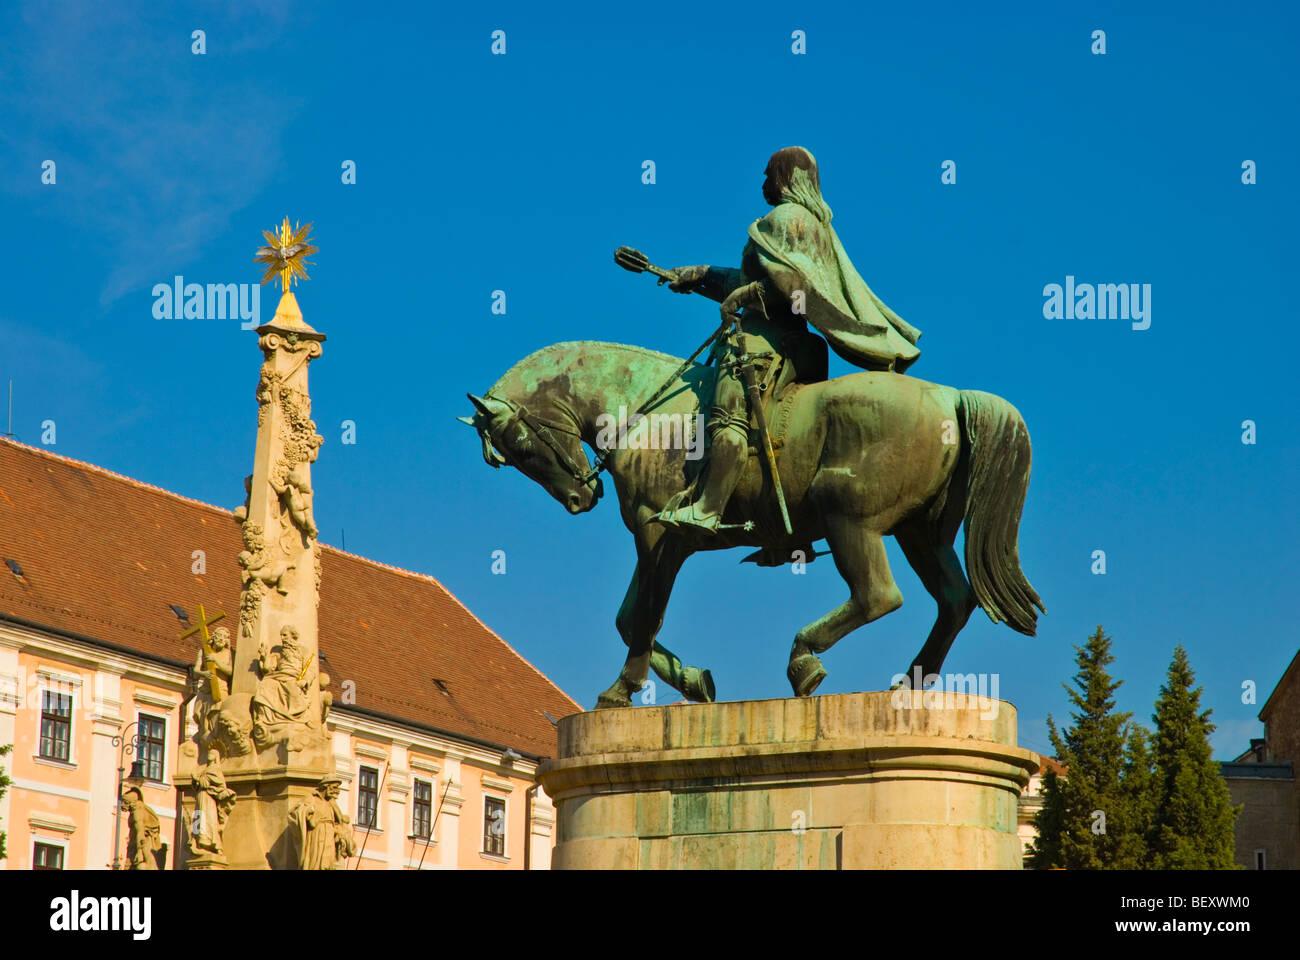 Szechenyi ter square Pecs Hungary Europe - Stock Image